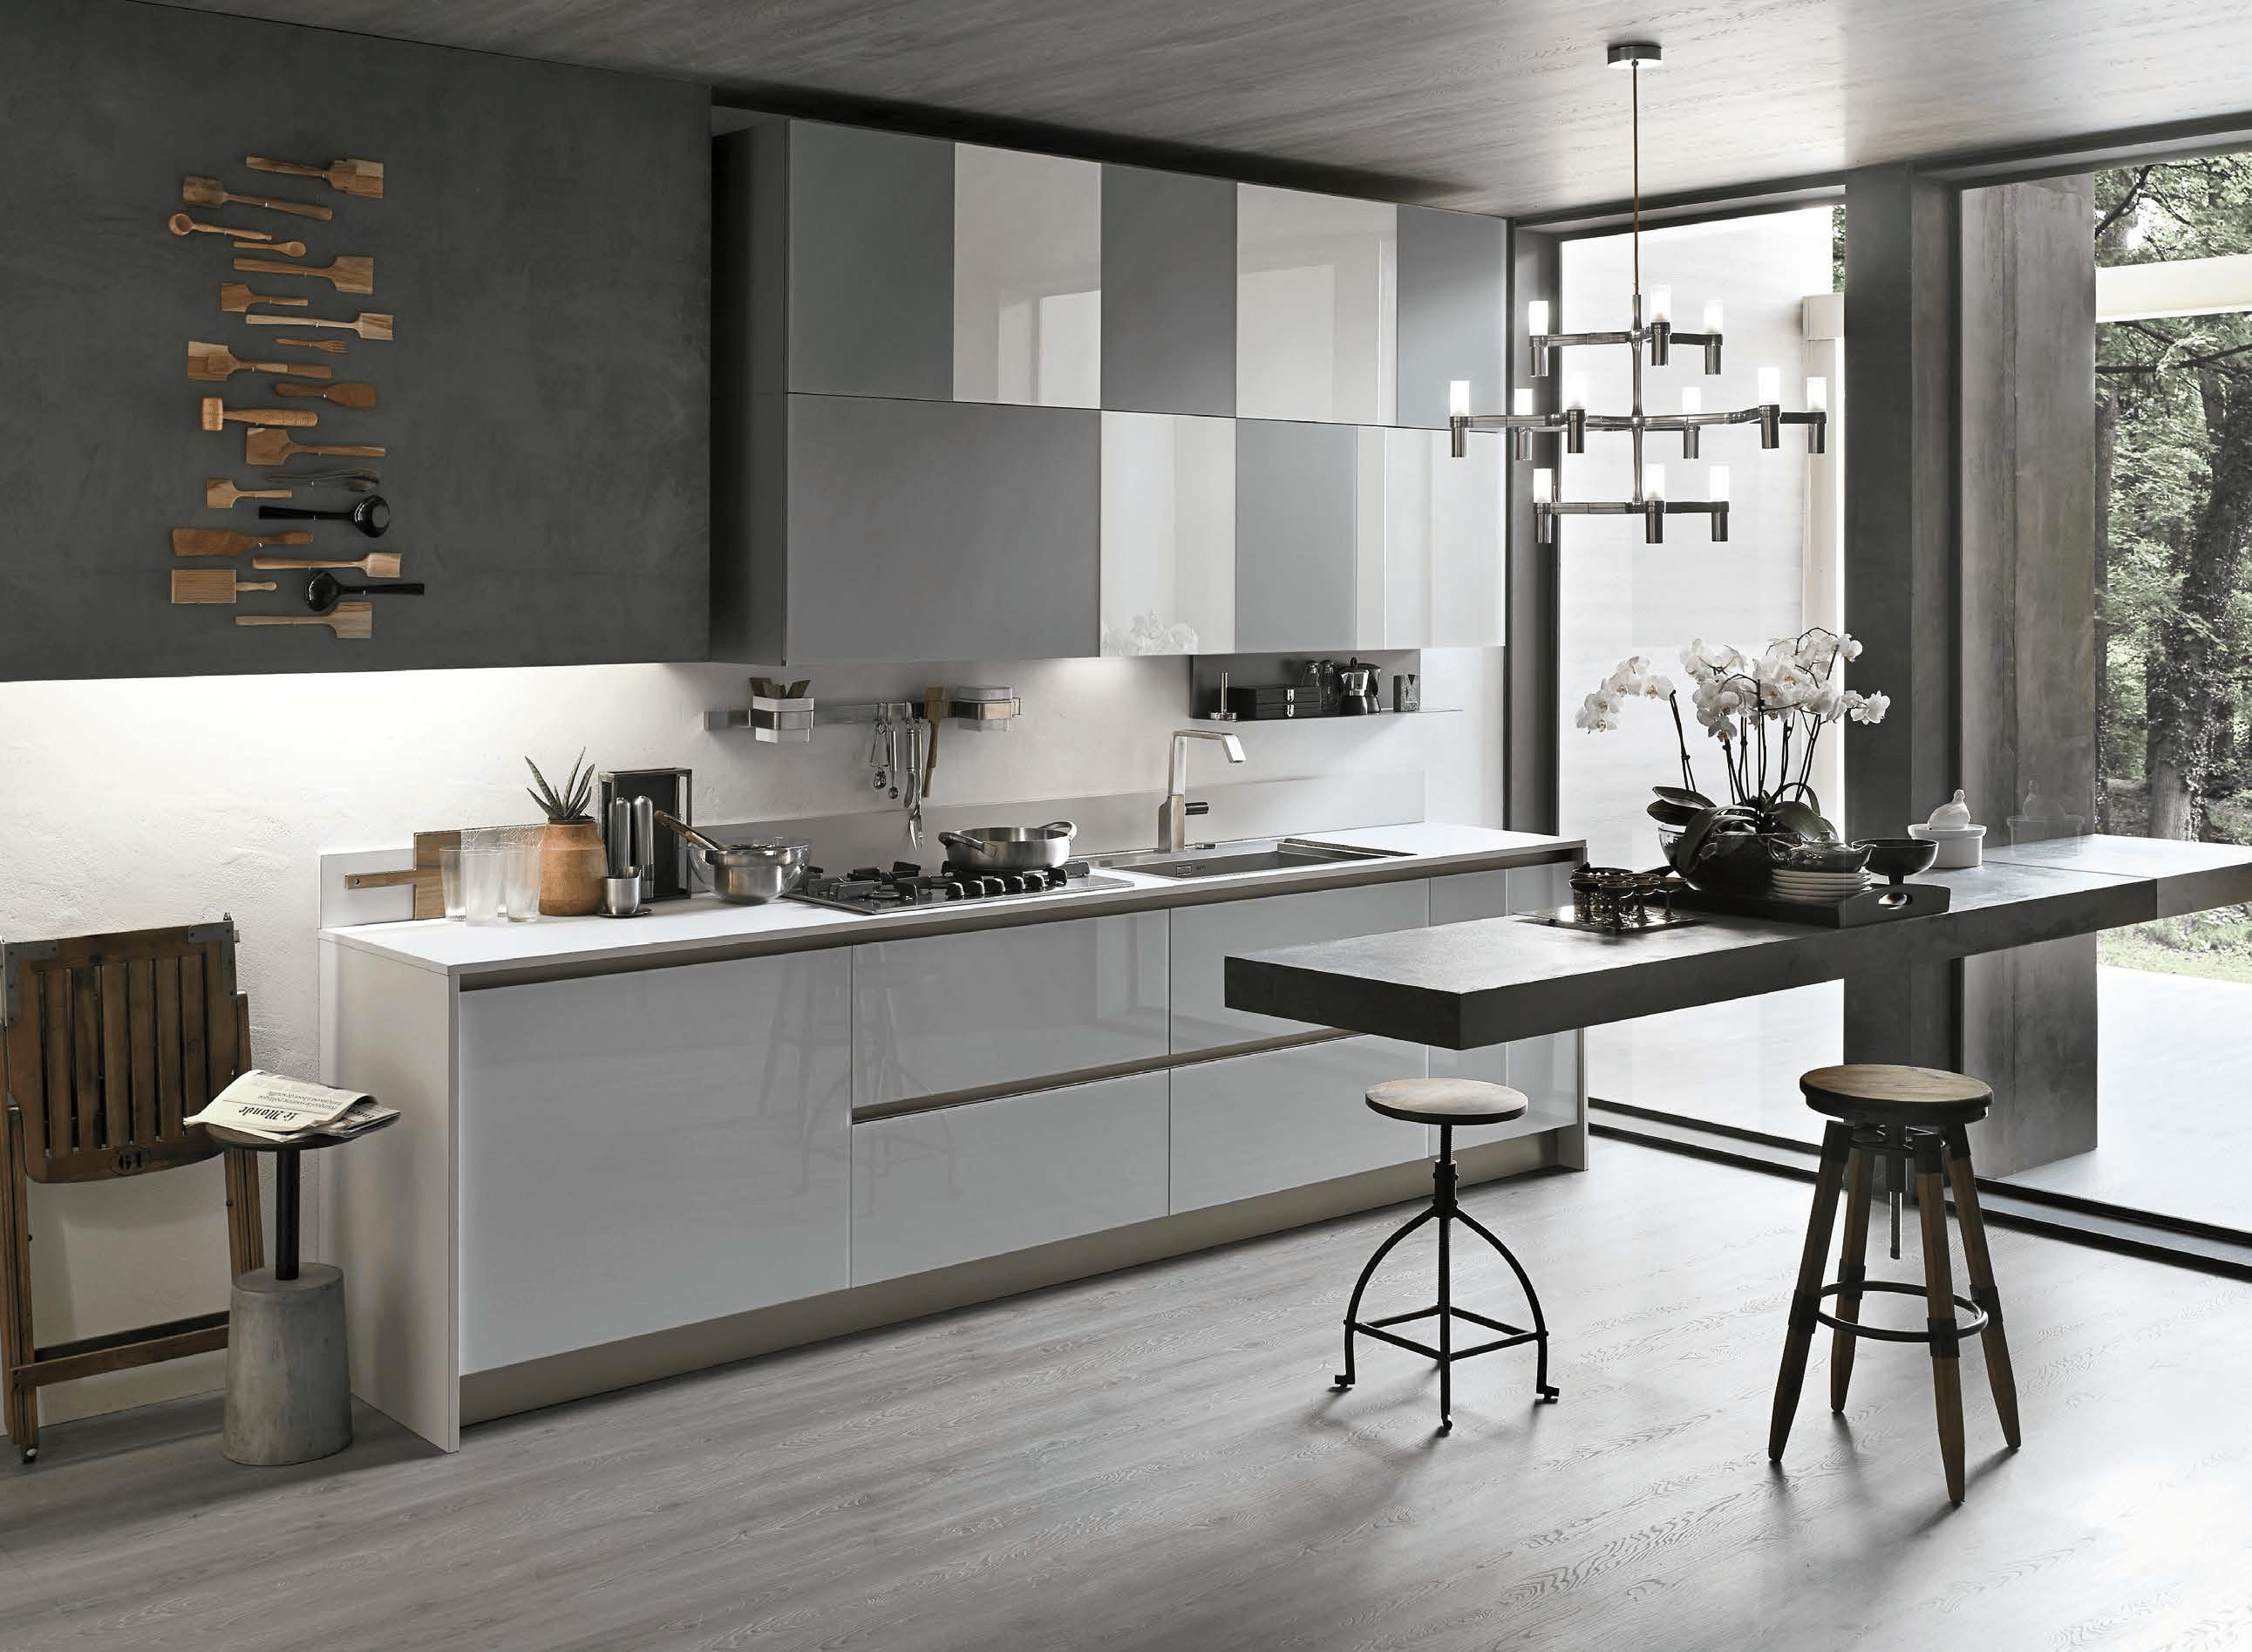 Cucine moderne aliant stosa cagliari cucine cagliari stosa moderne contemporanee e classiche - Cucine lineari moderne ...